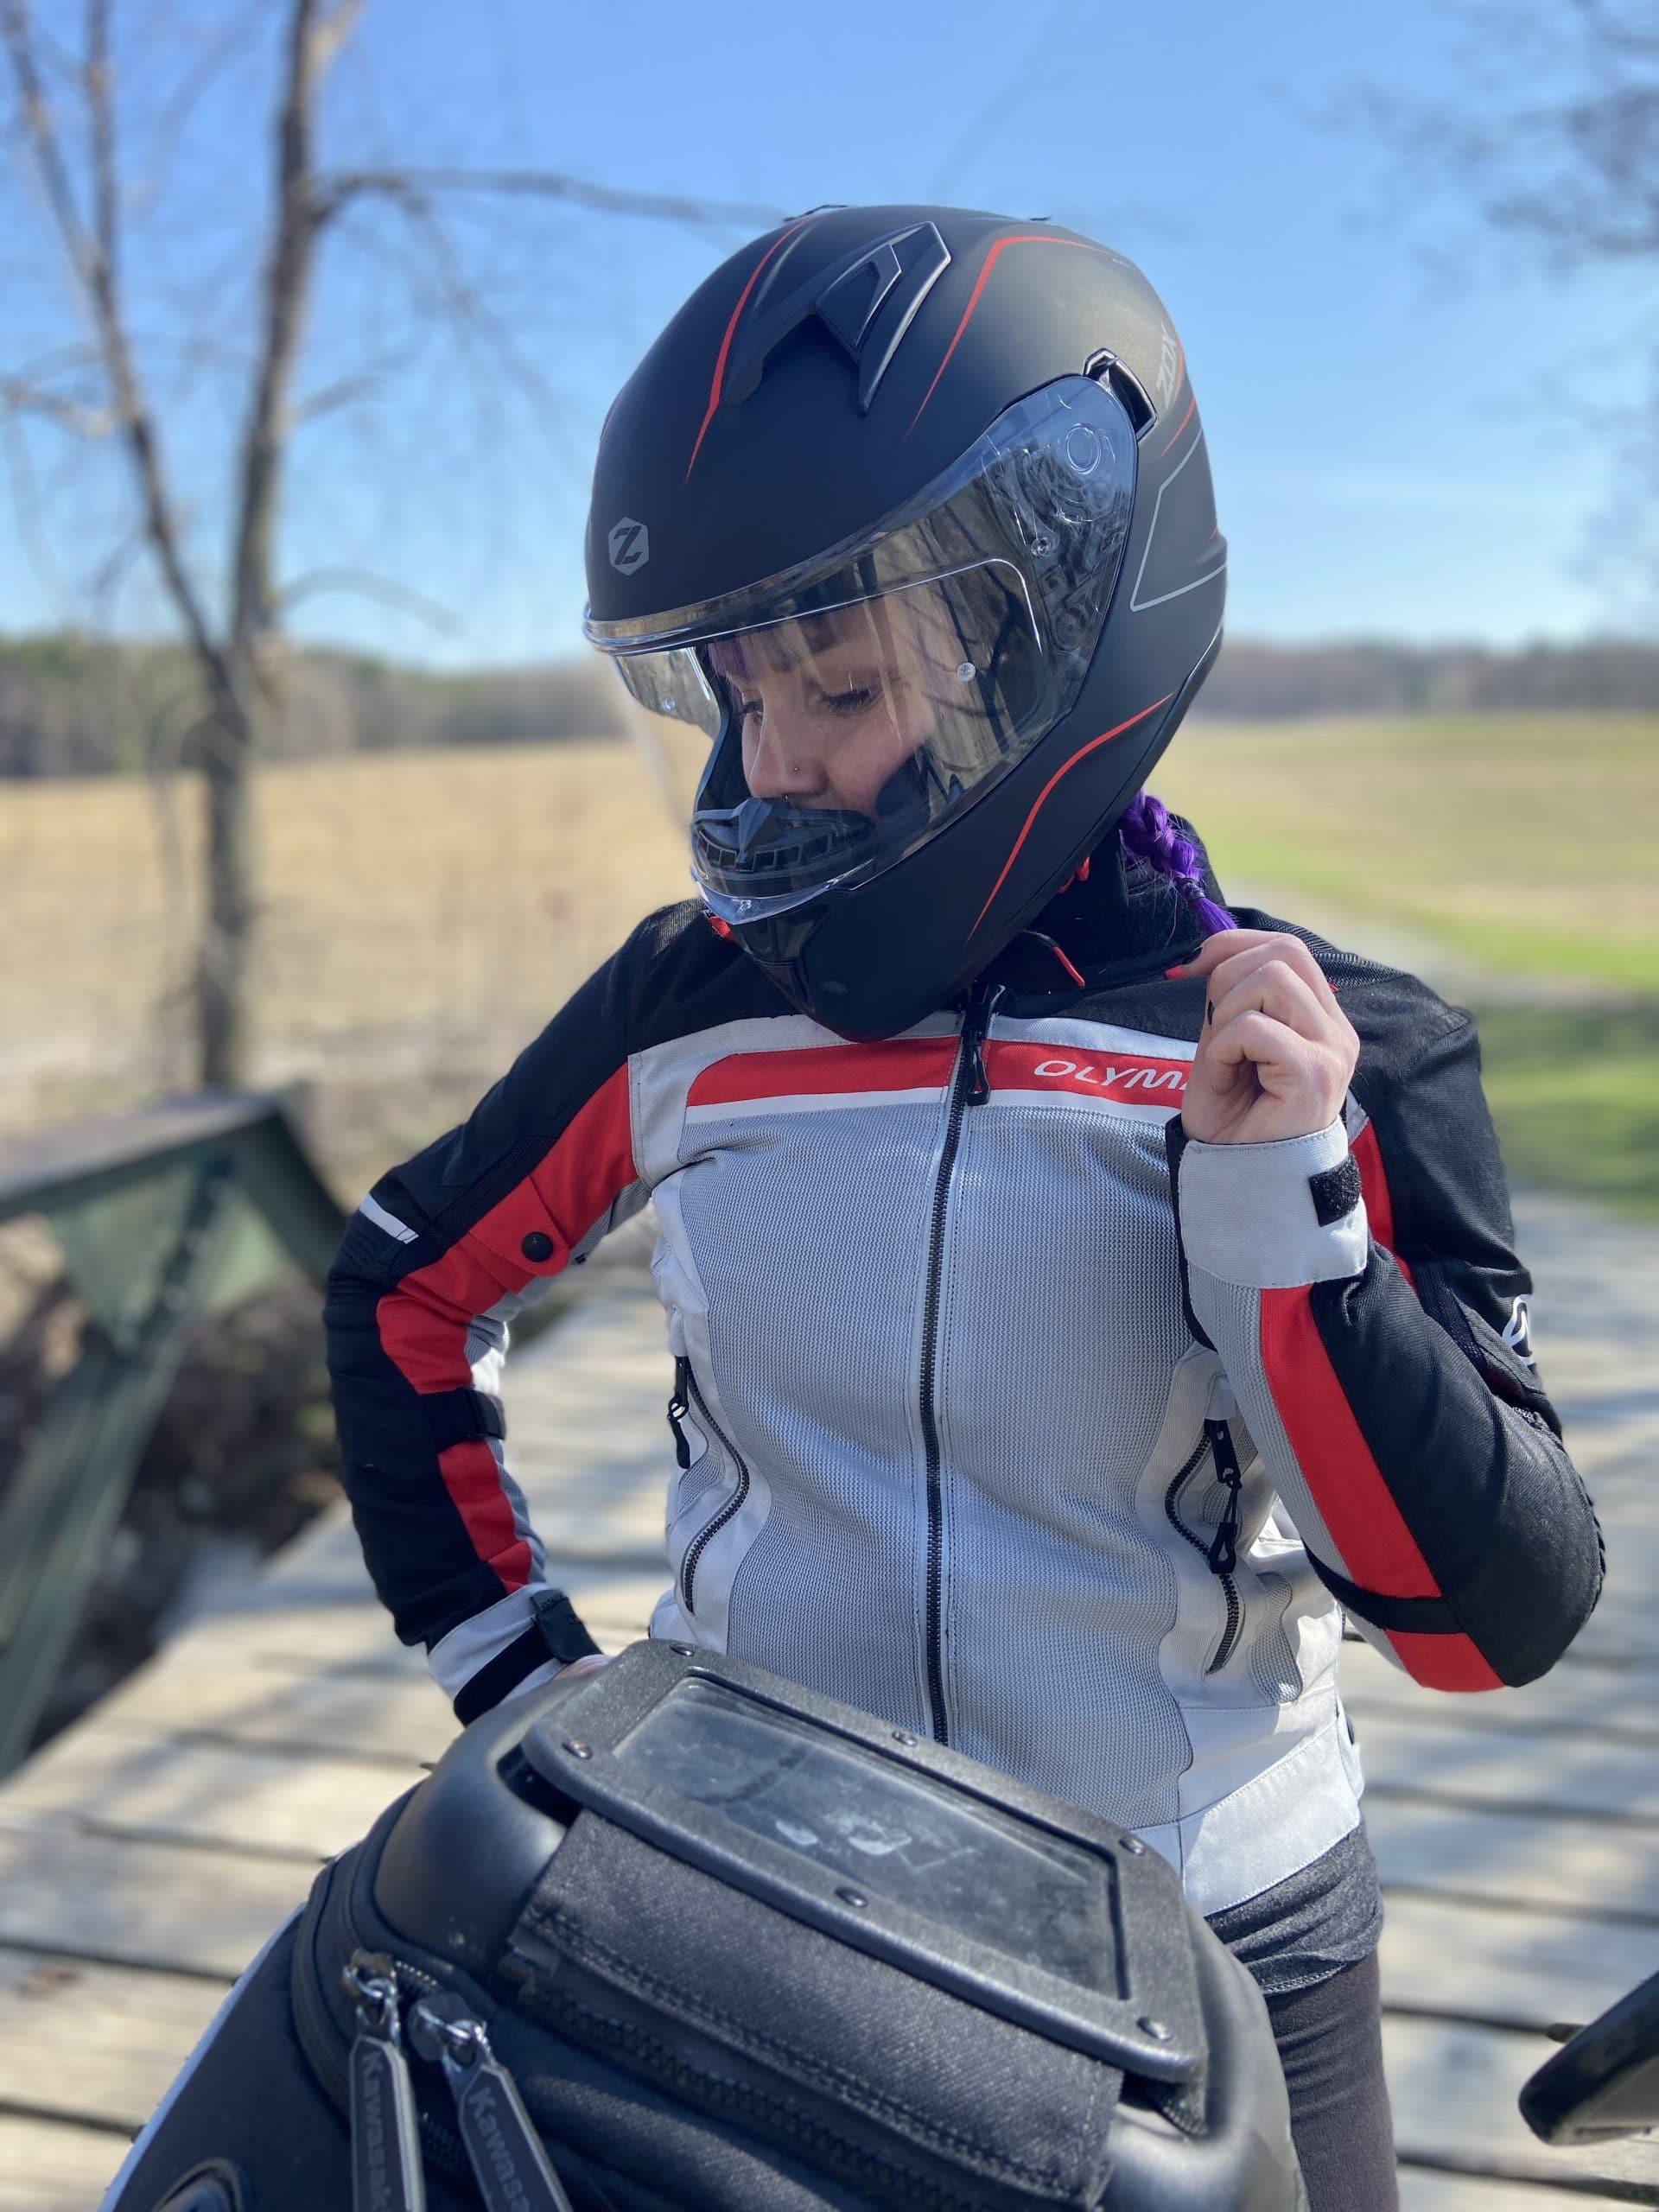 Em looking really great with her Zox Zenith Monza Helmet